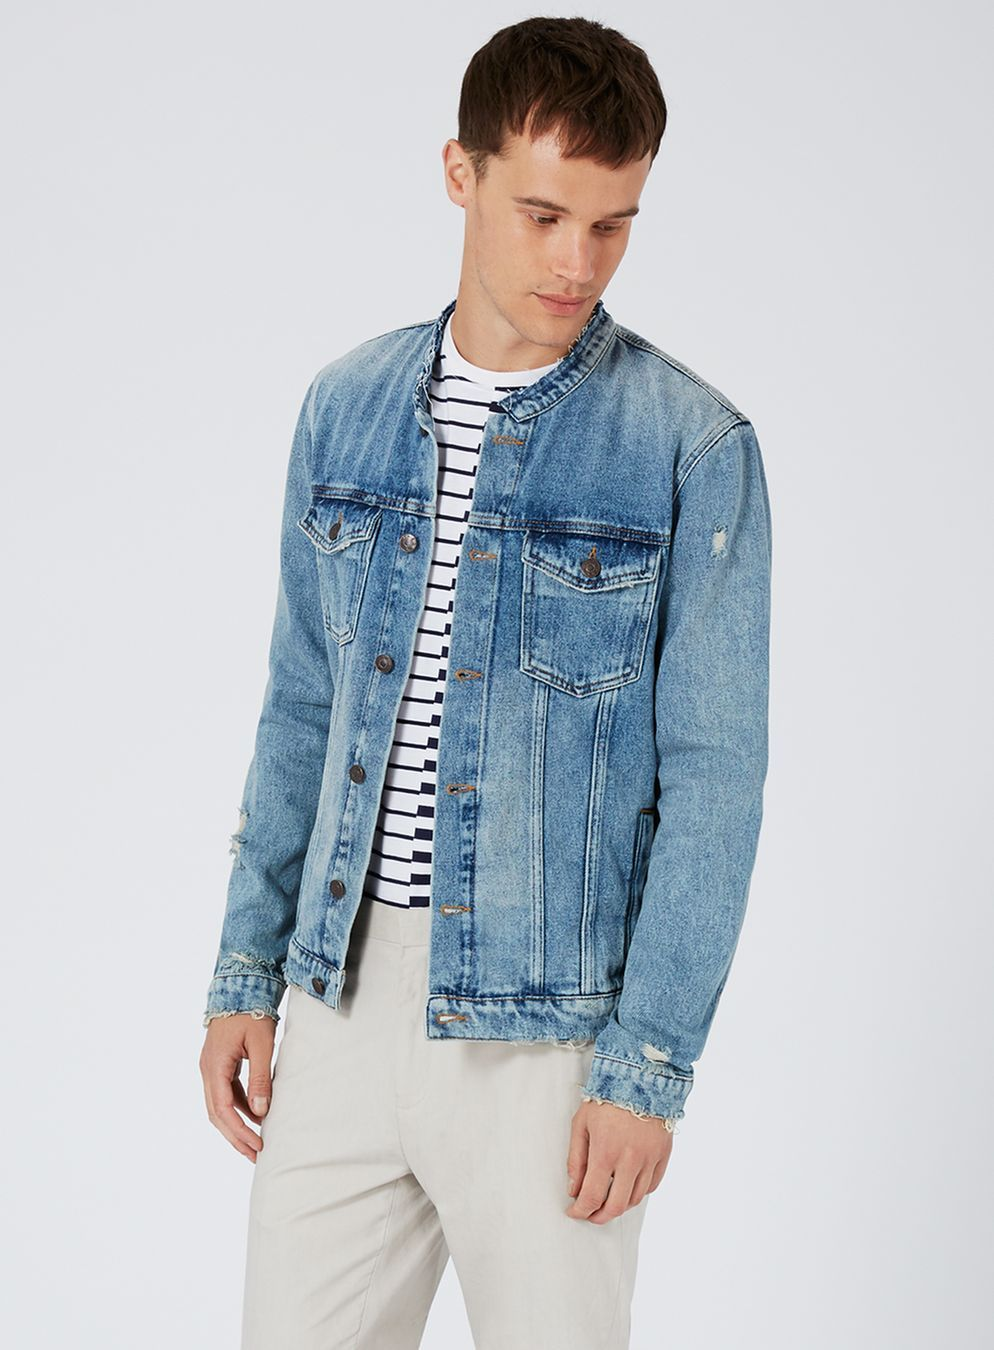 Blue Collarless Denim Jacket Collarless Denim Jacket Denim Jacket Denim Ideas [ 1350 x 994 Pixel ]